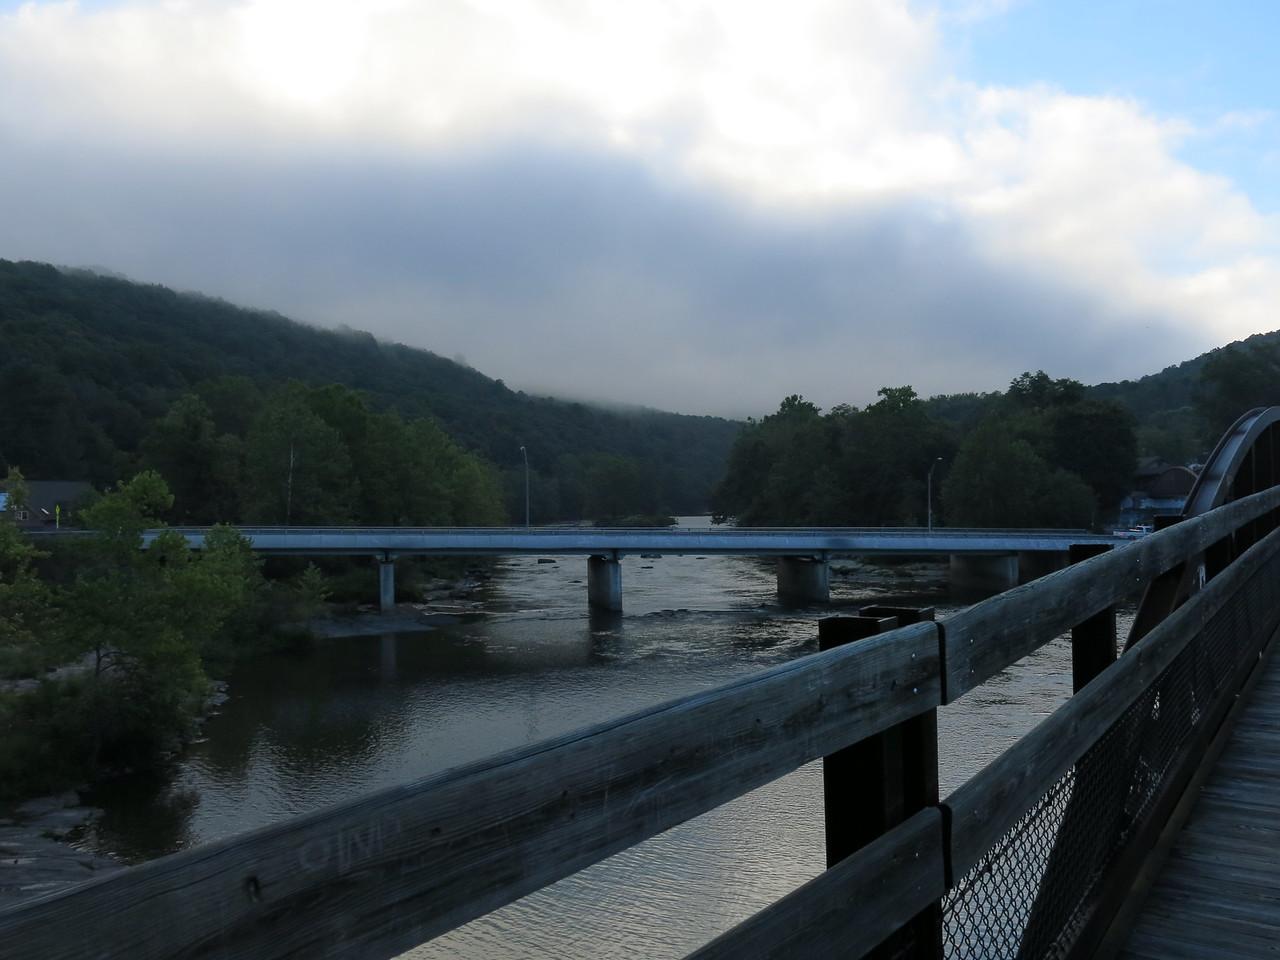 Upstream view from Low Bridge